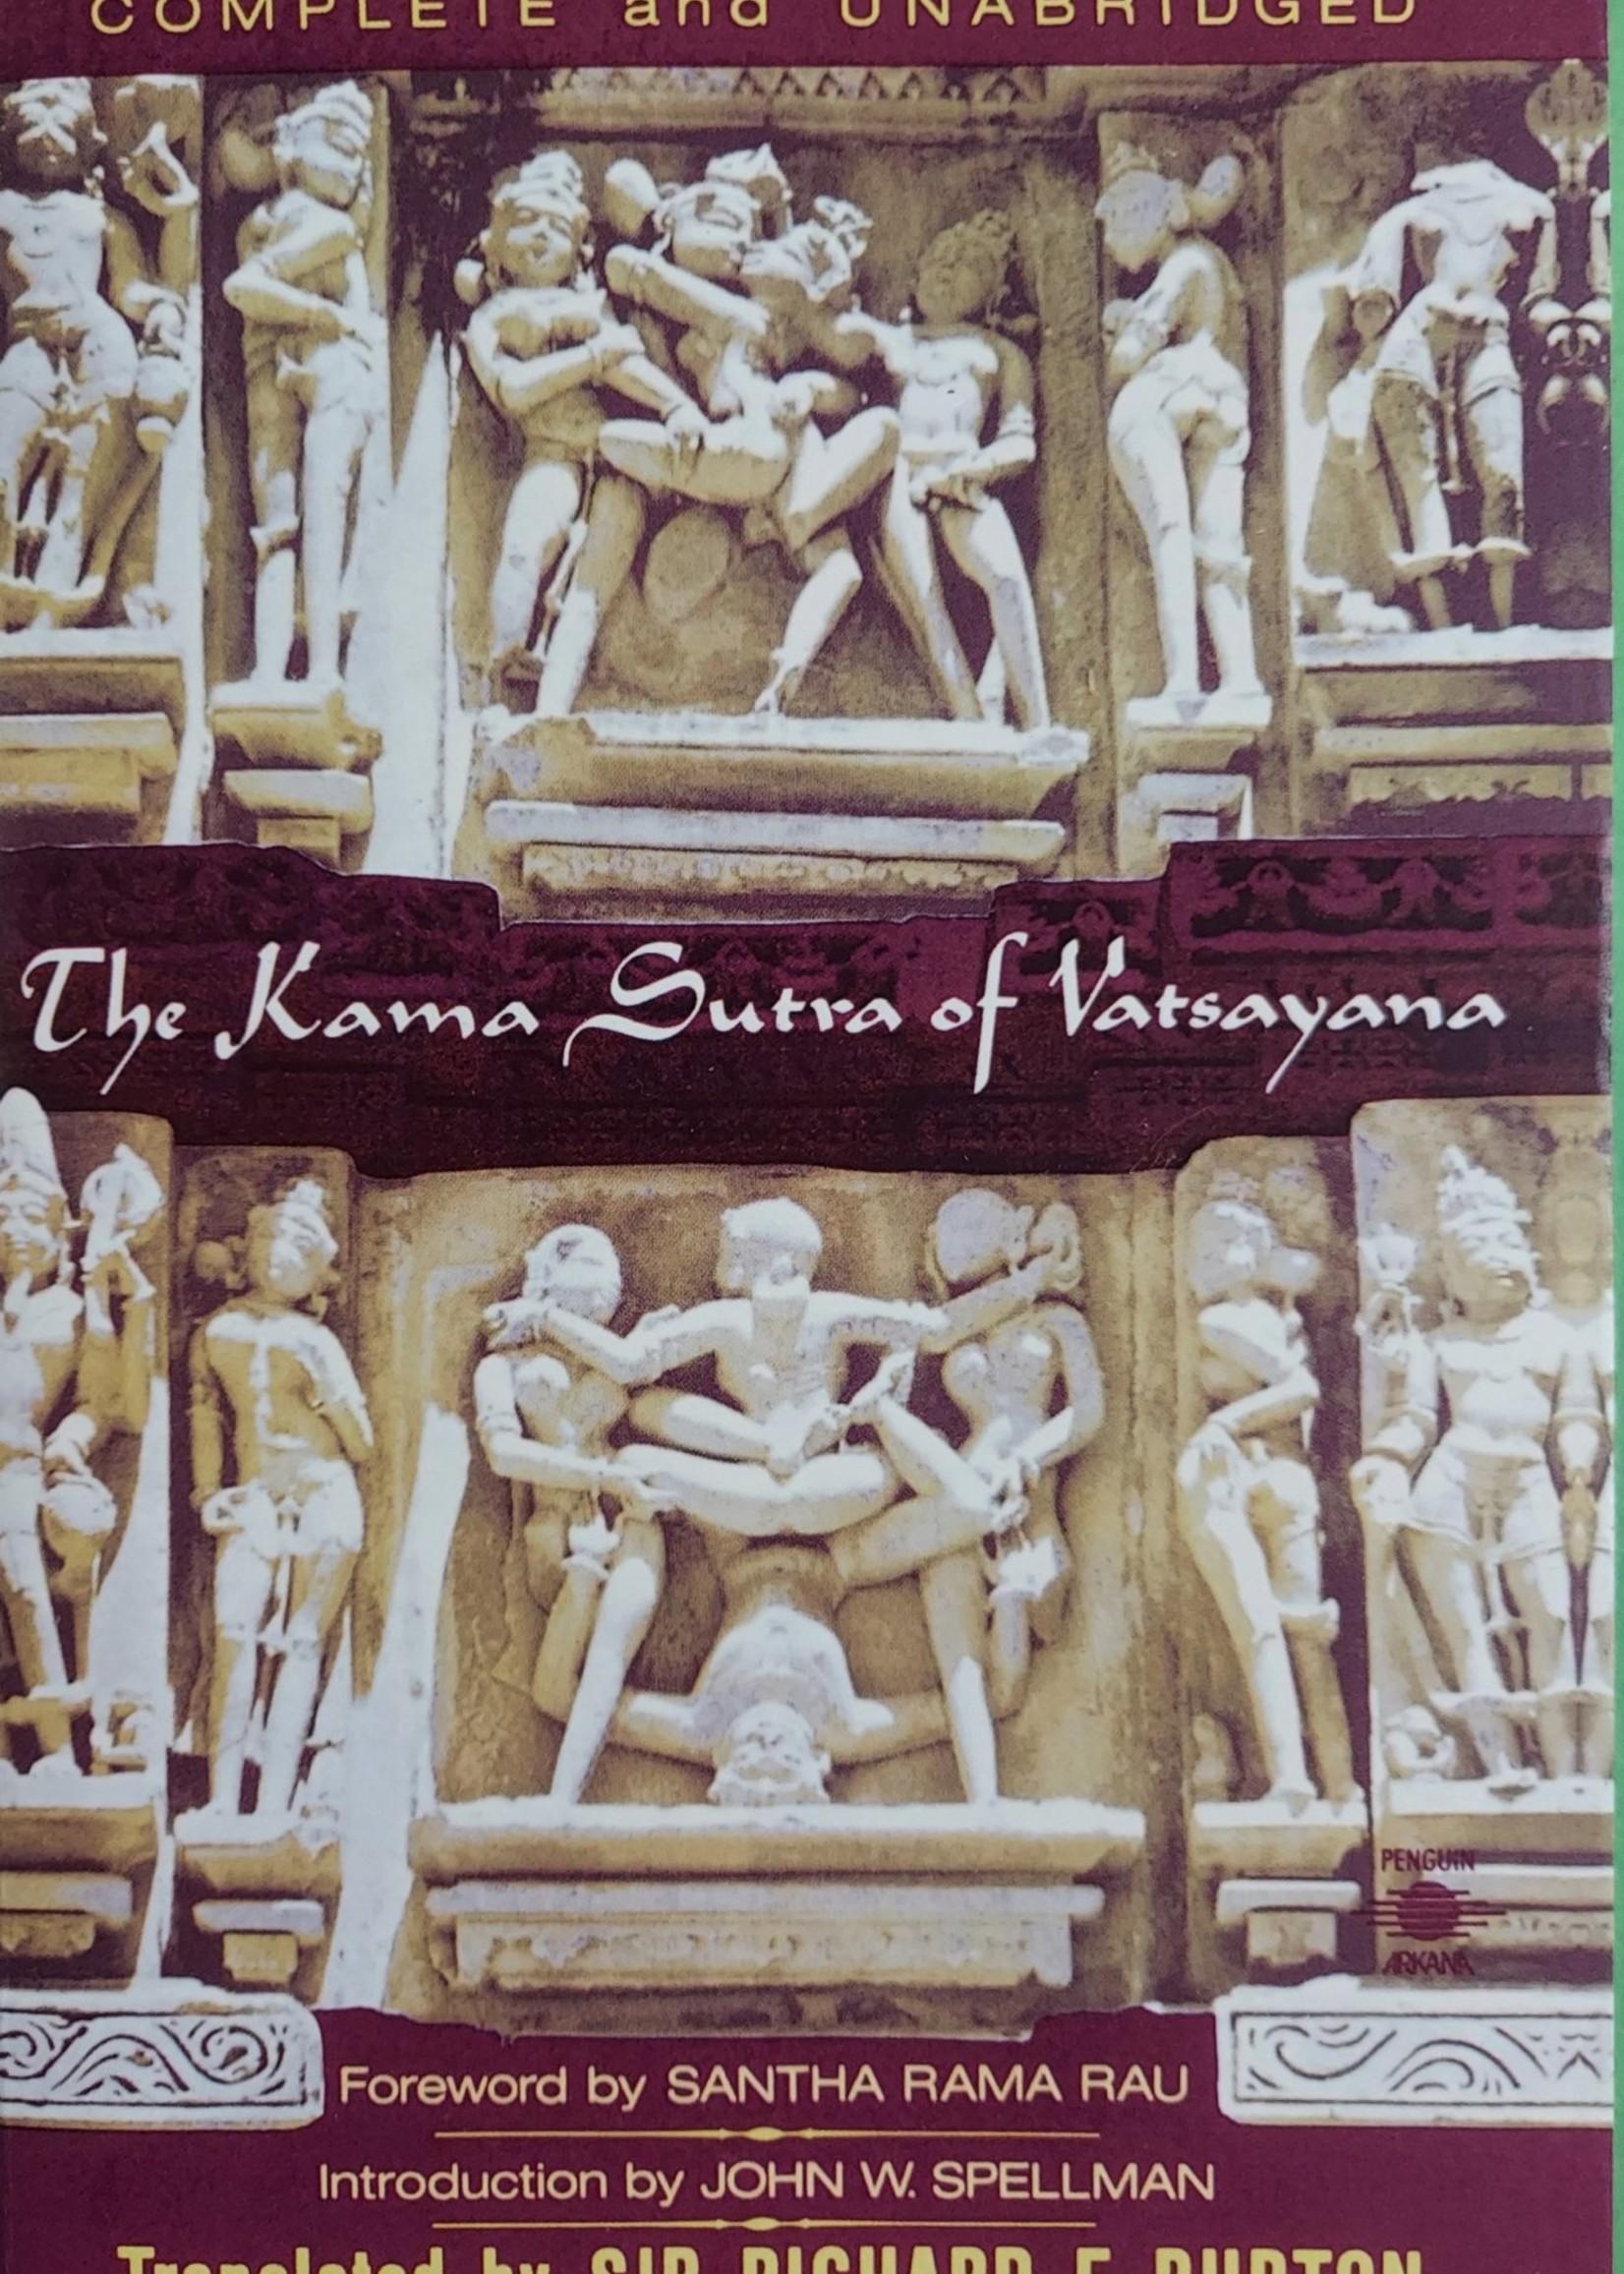 The Kama Sutra of Vatsayana-THE CLASSIC HINDU TREATISE ON LOVE AND SOCIAL CONDUCT By VATSAYANA Foreword by Santha Rama Rau Introduction by John W. Spellman Translated by Richard Francis Burton